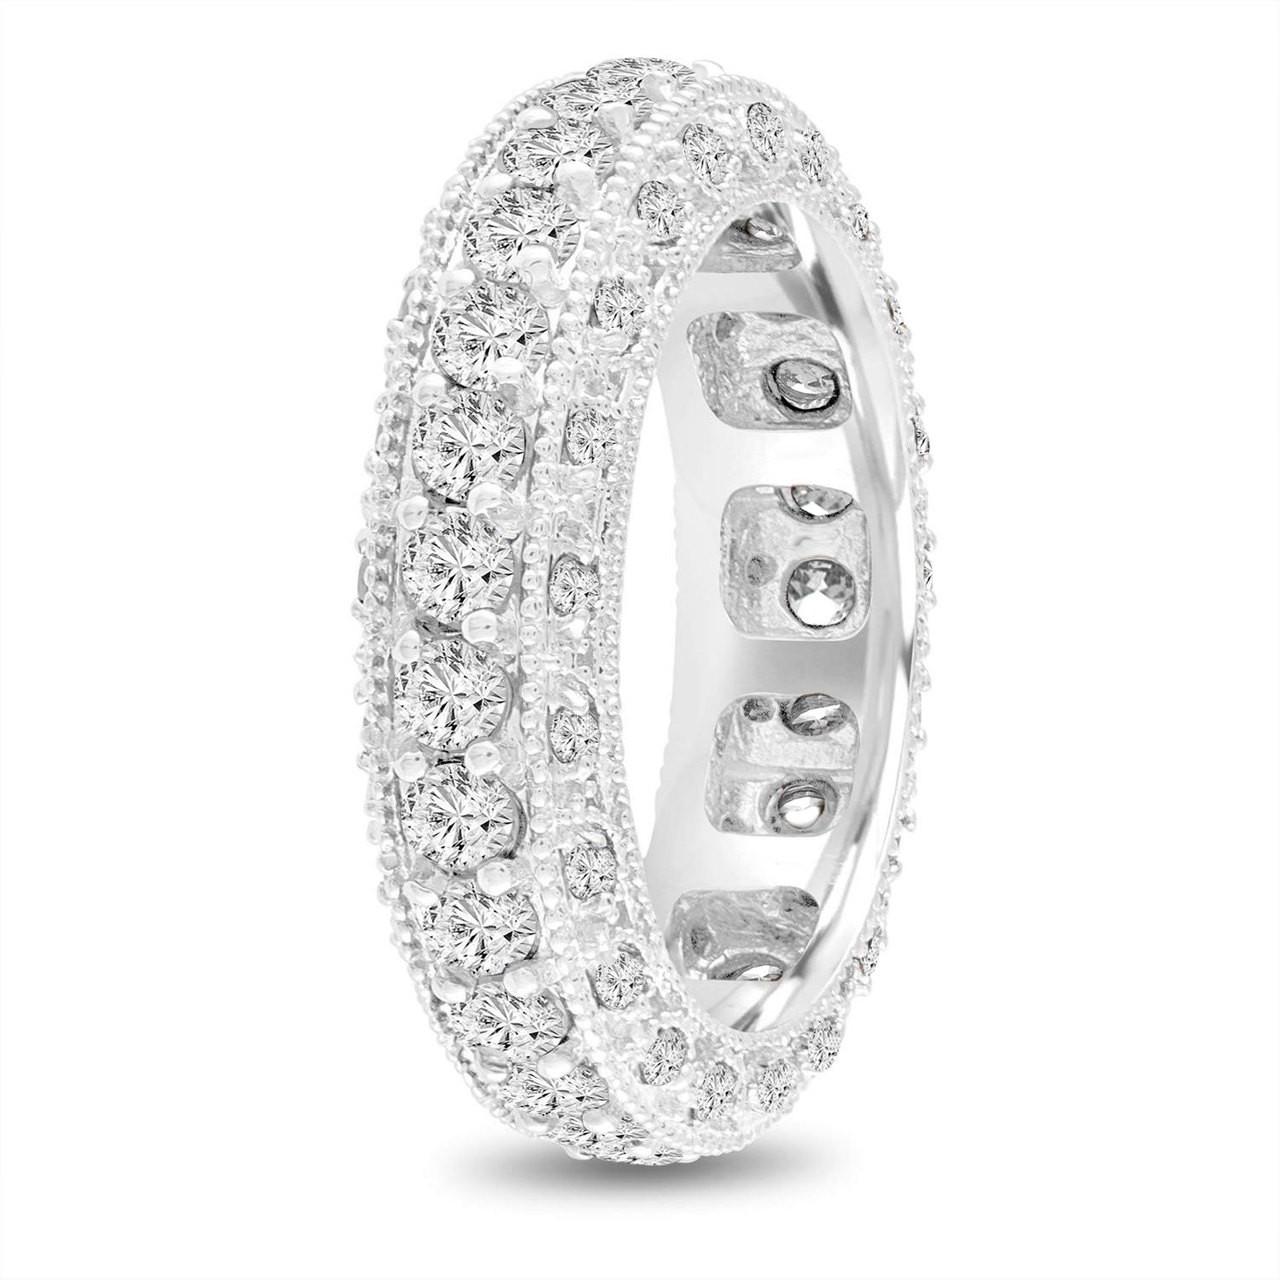 Eternity Diamond Wedding Ring Mens Diamond Wedding Band Vintage Wedding Band 6 Mm Unique Wedding Band 14k White Gold 2 50 Carat Handmade